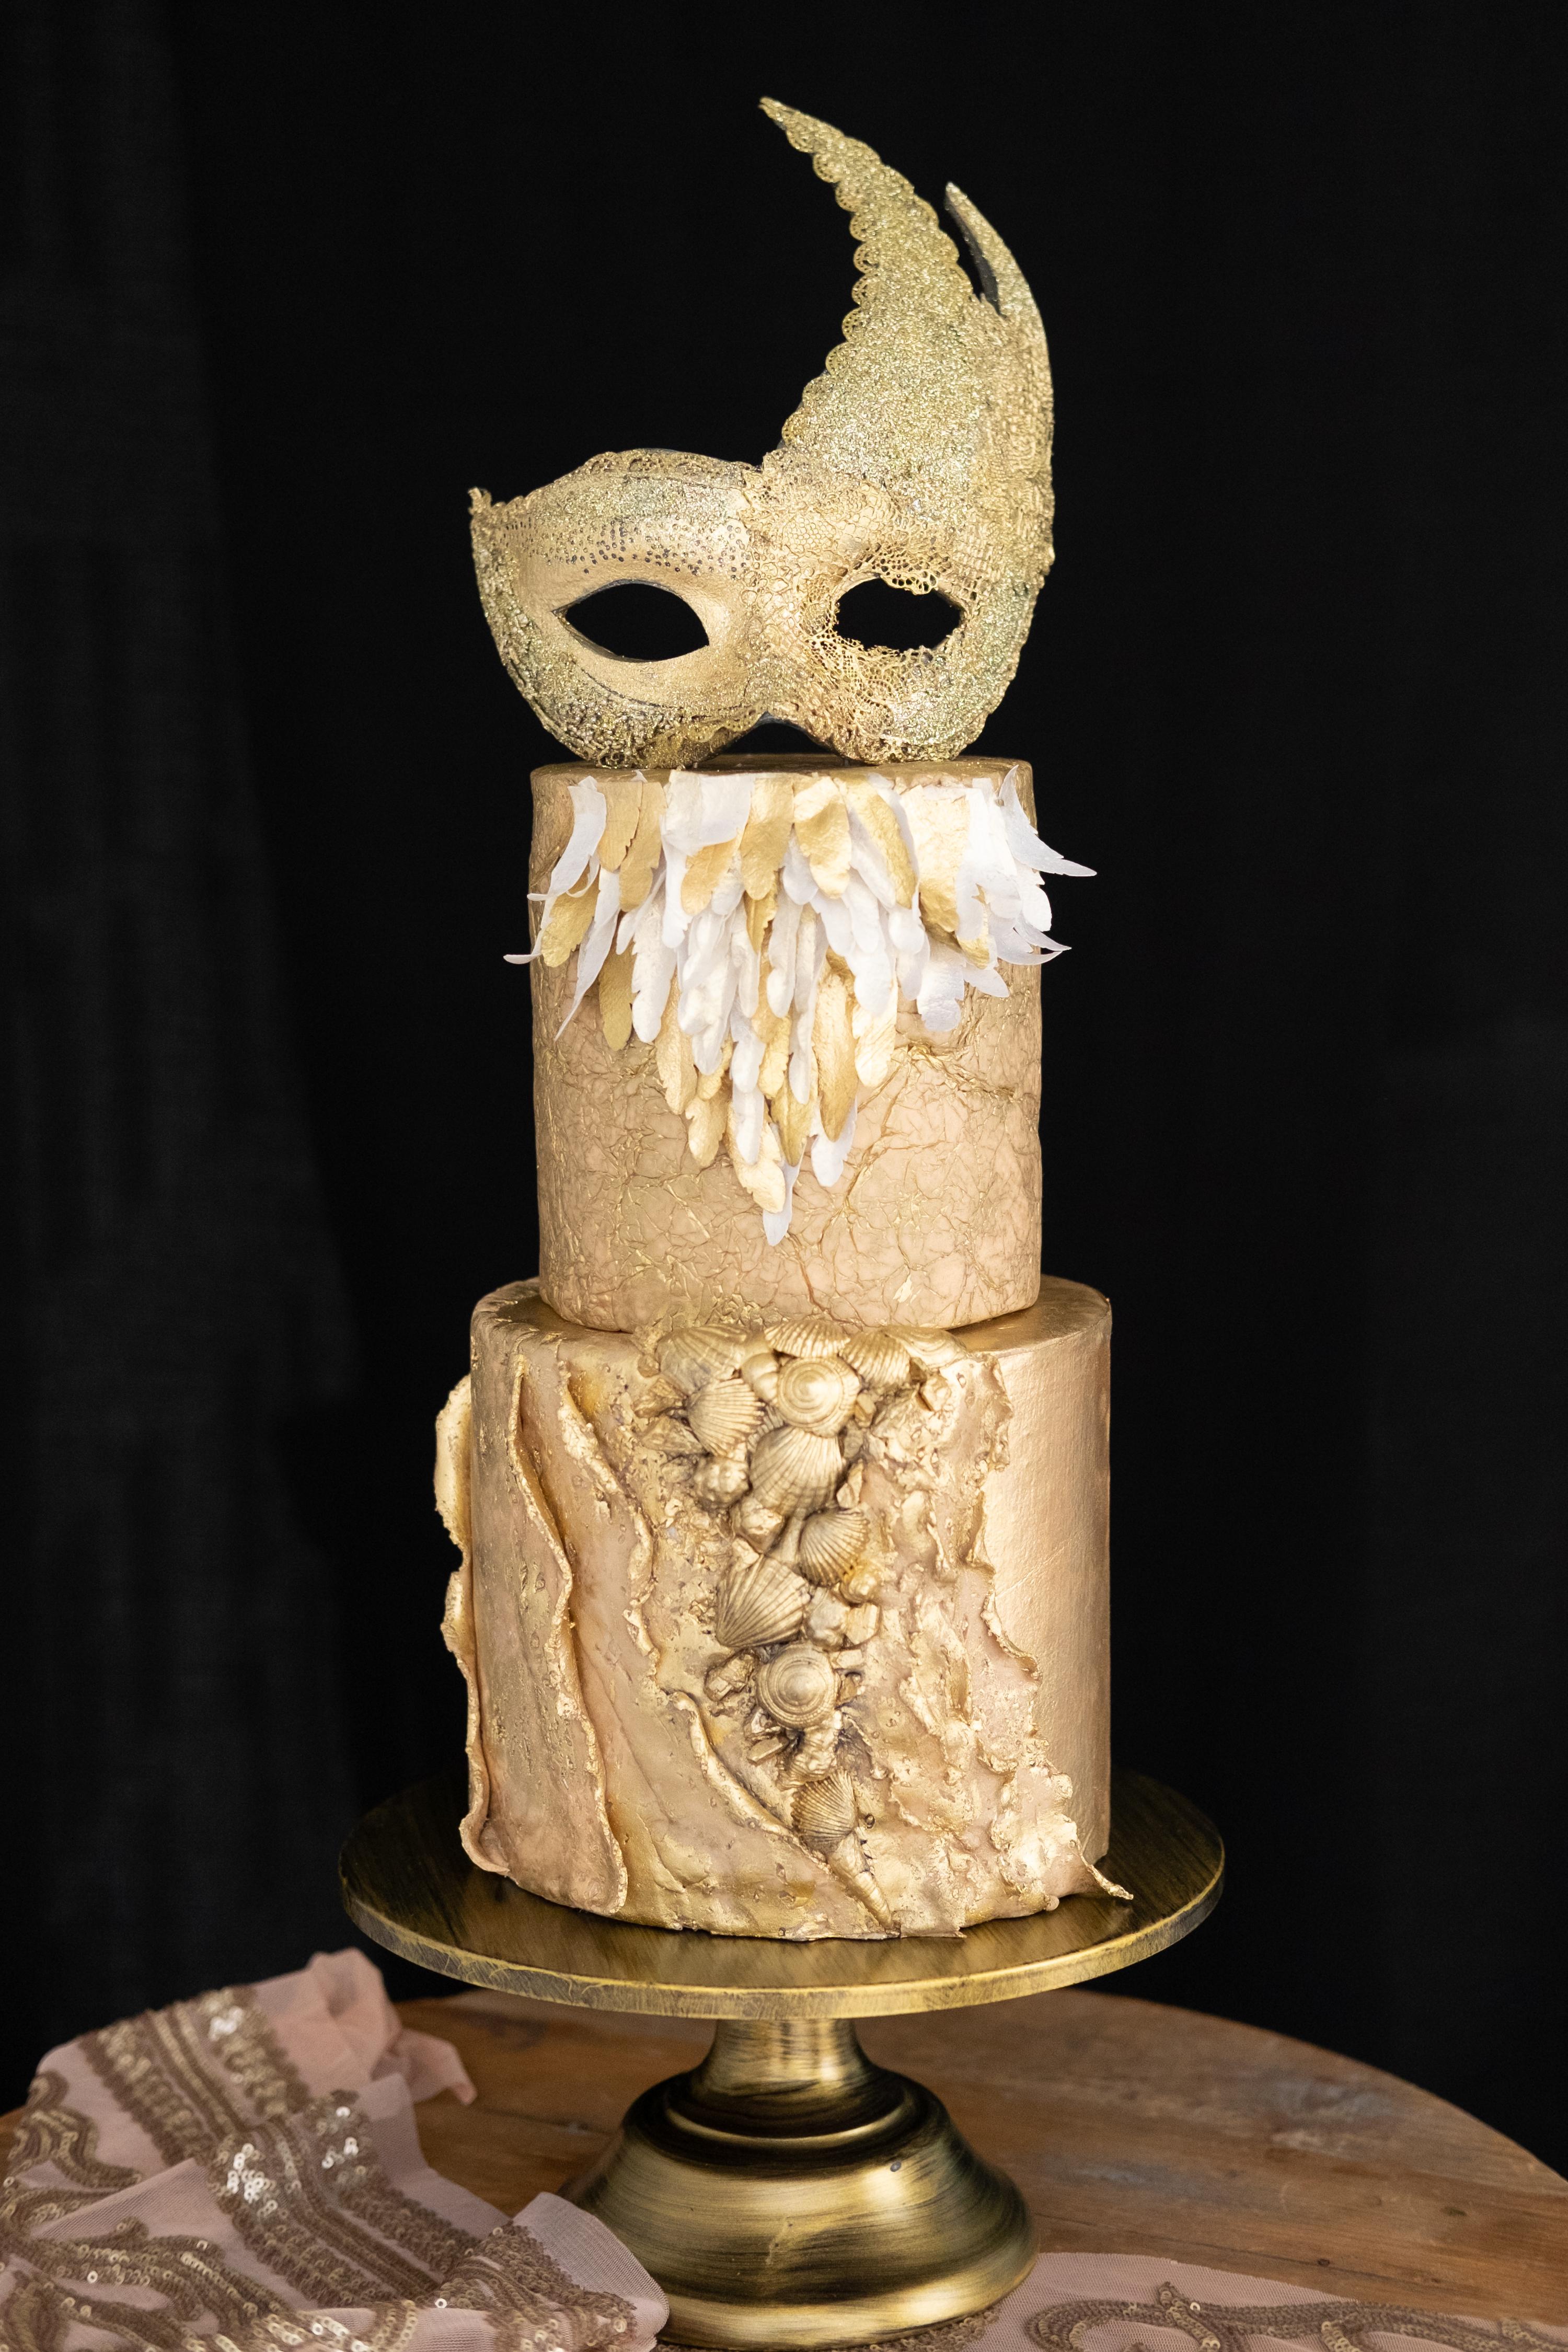 Gold fondant masquerade cake